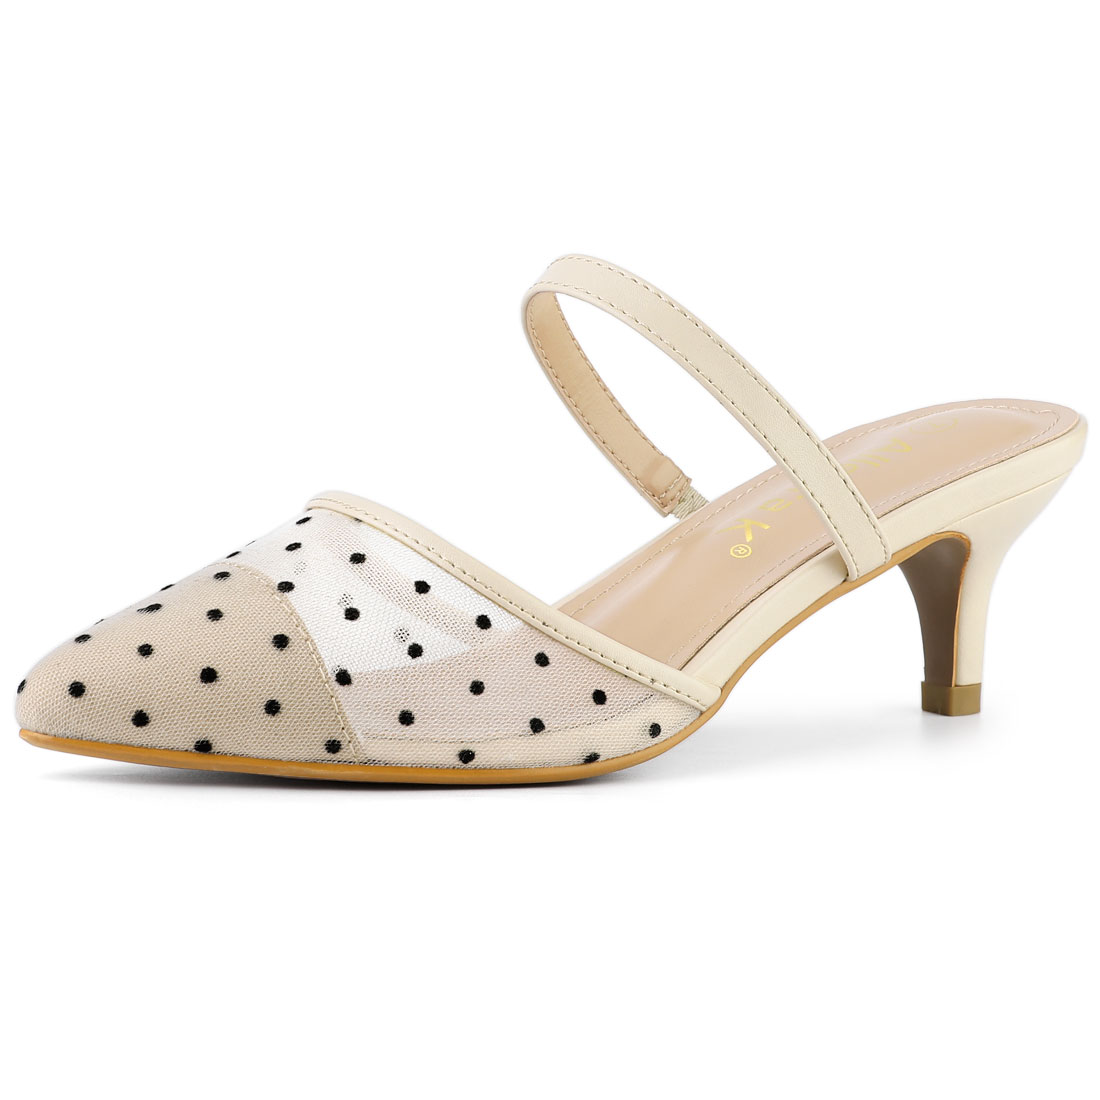 Allegra K Women's Point Toe Polka Dot Kitten Heel Mesh Mules Beige US 6